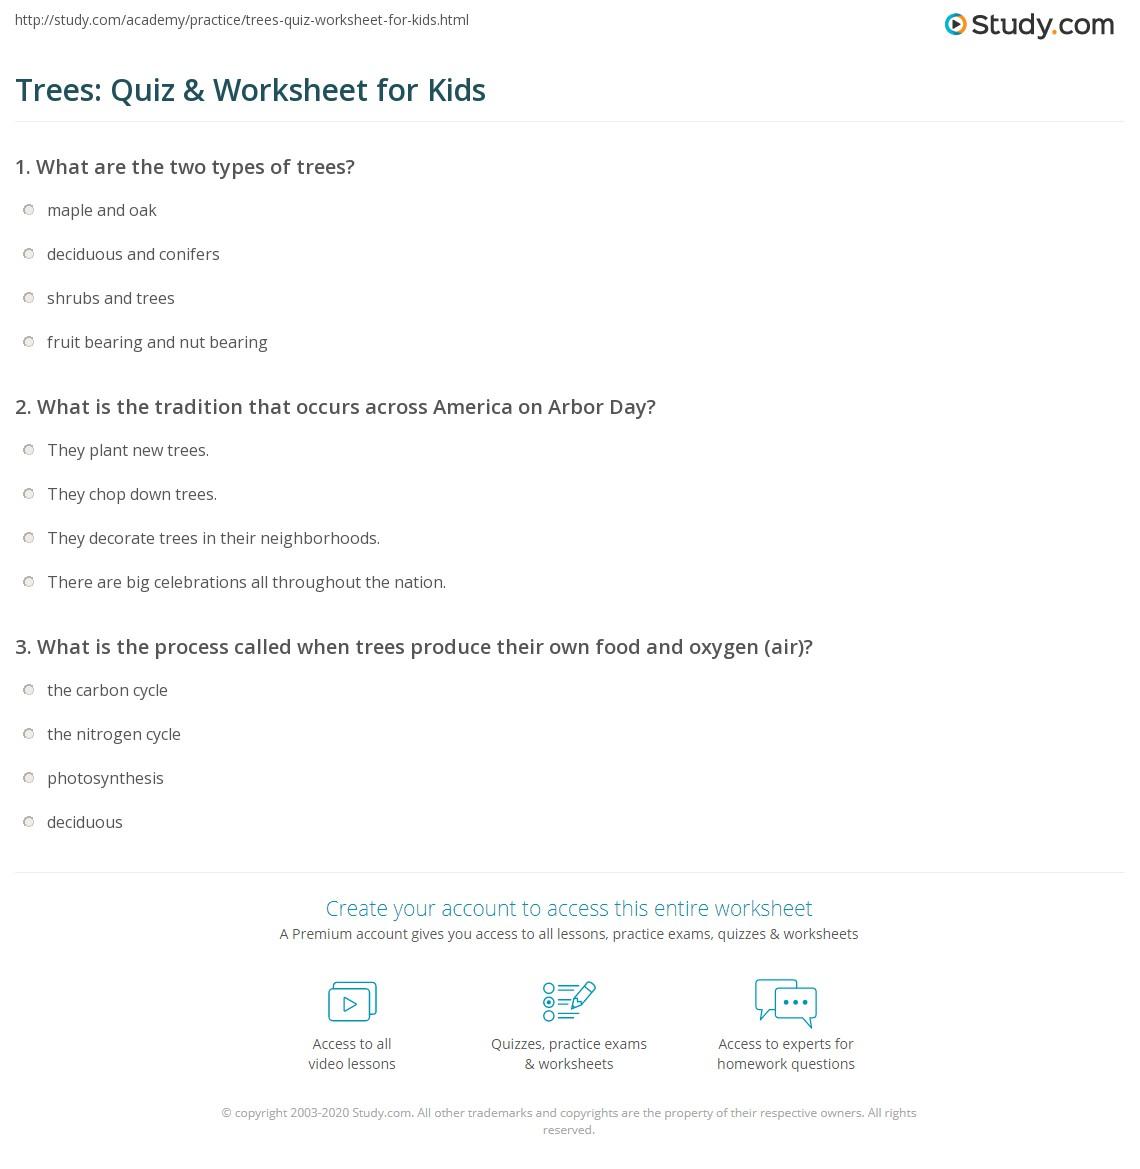 Trees: Quiz & Worksheet for Kids   Study.com